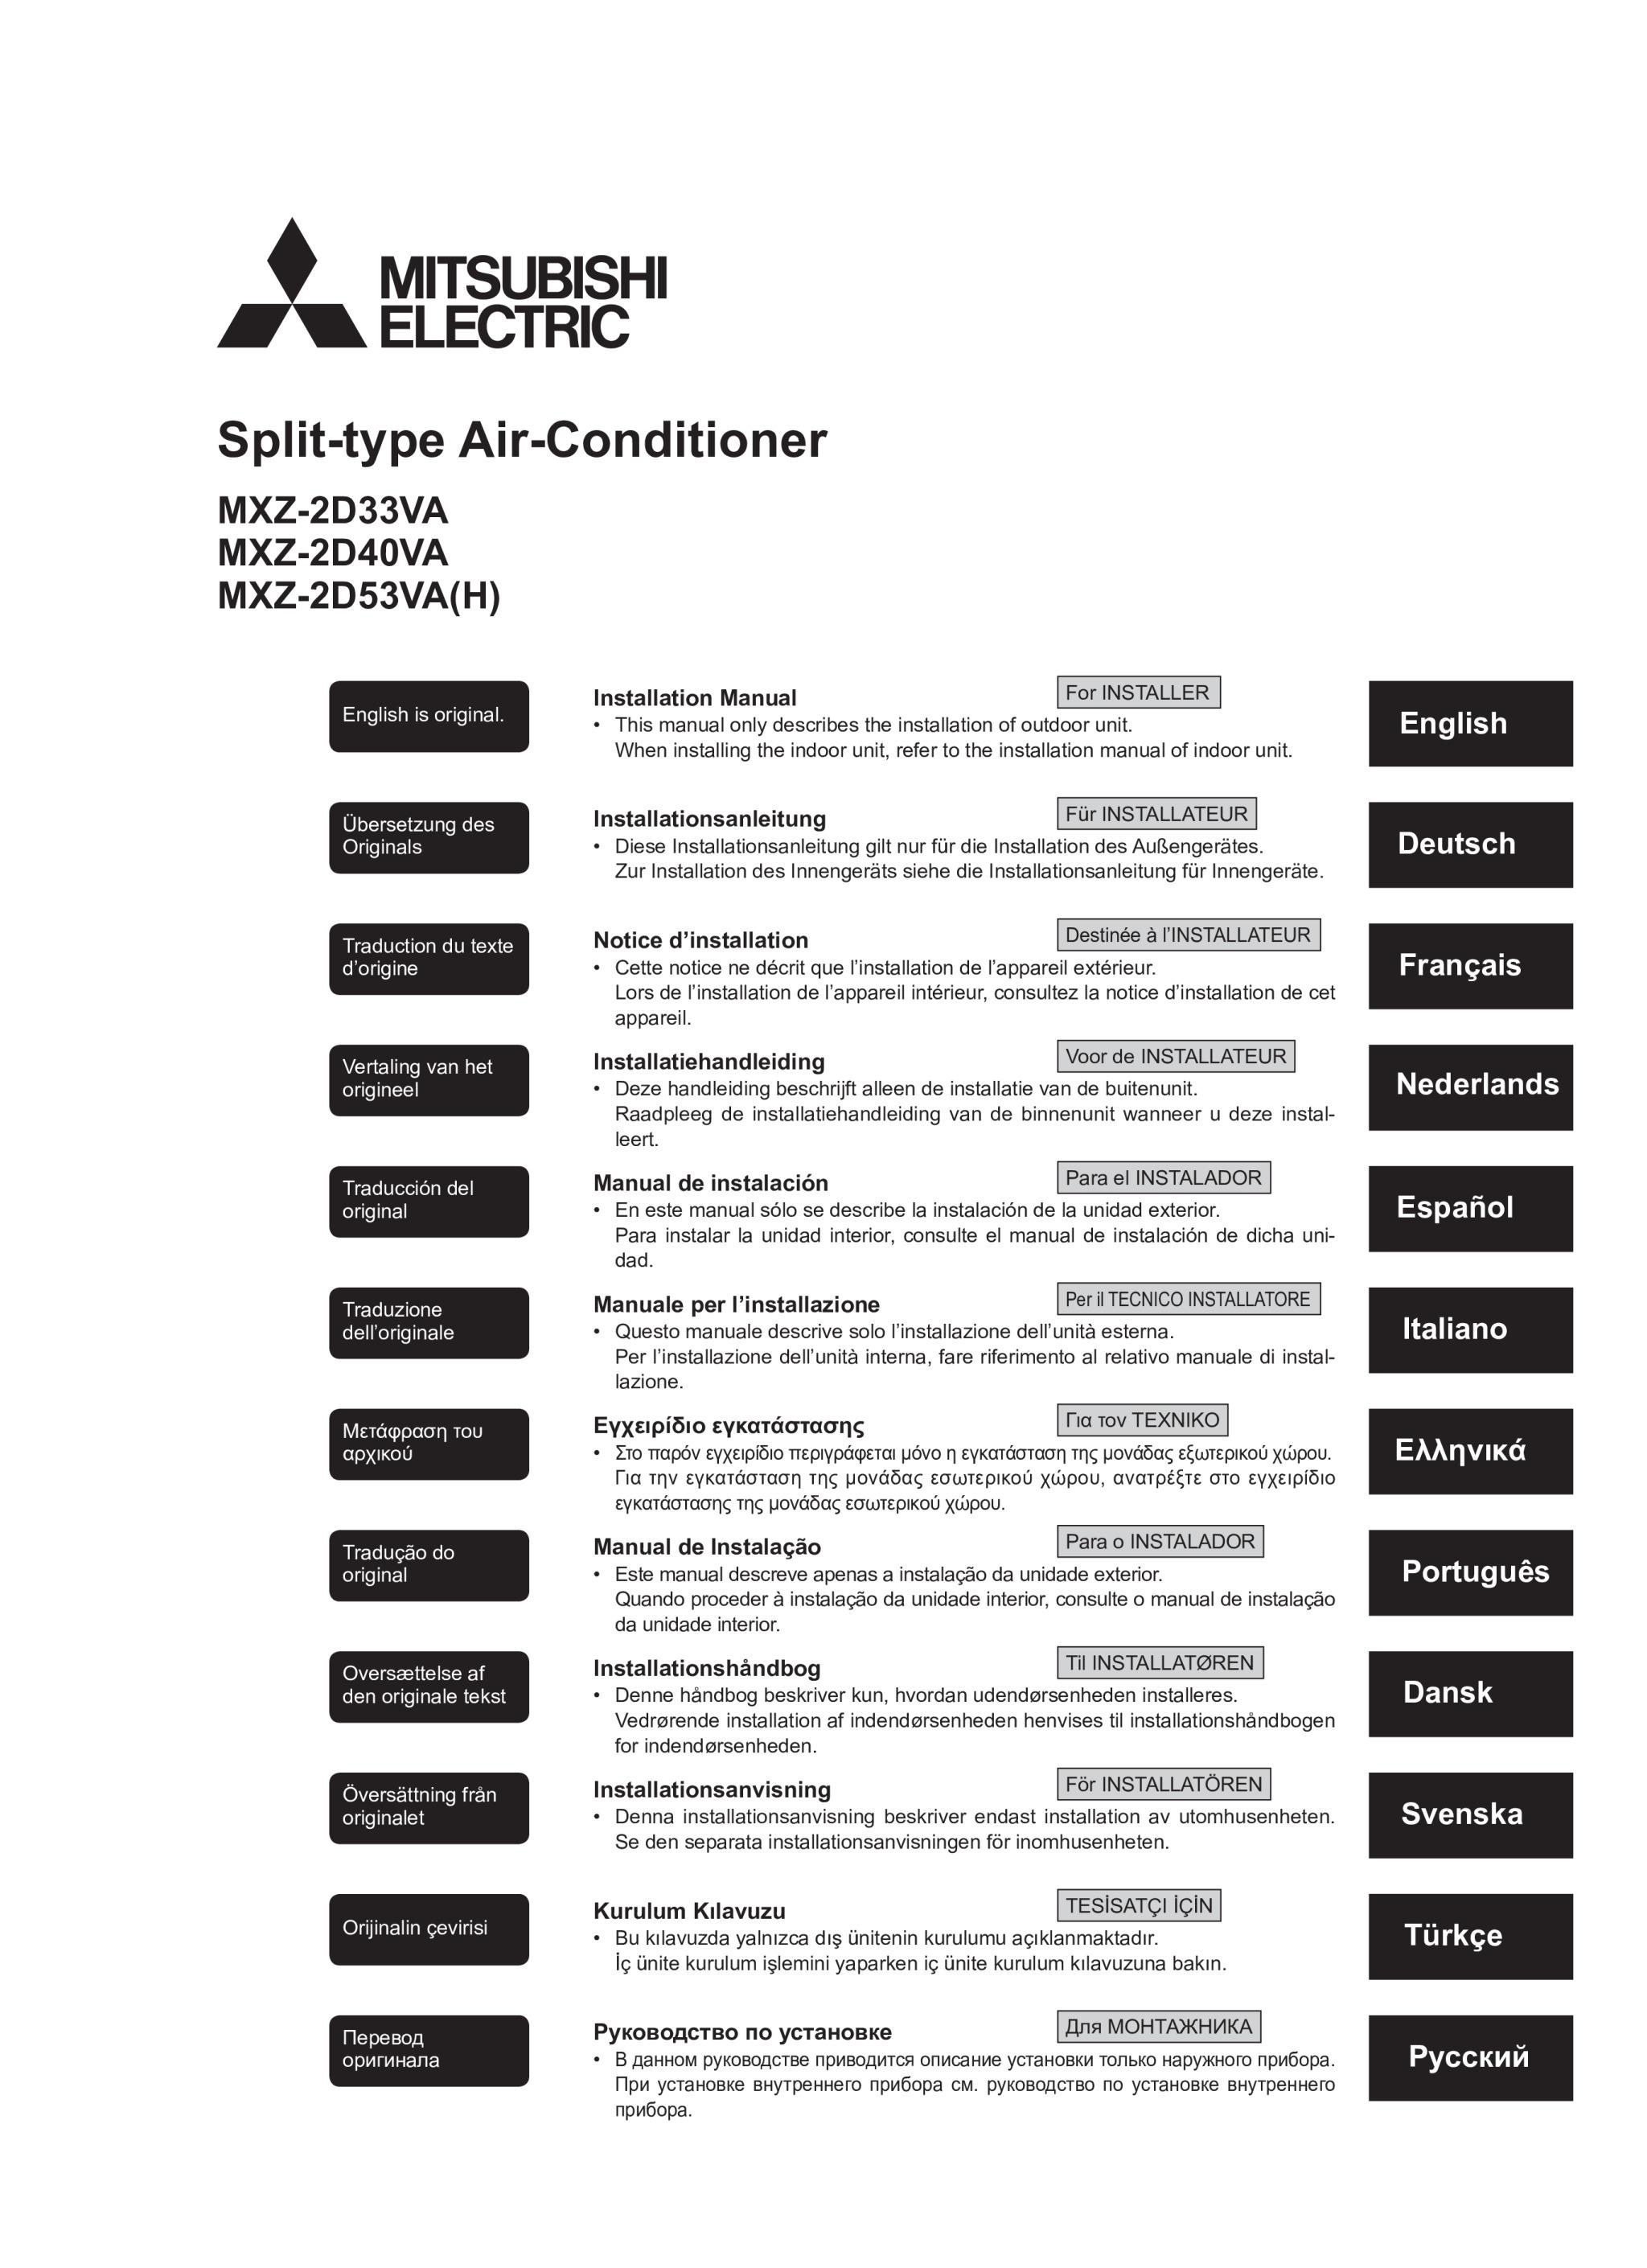 mxz series heat mitsubishi brochure multi hyper cf m products zone systems